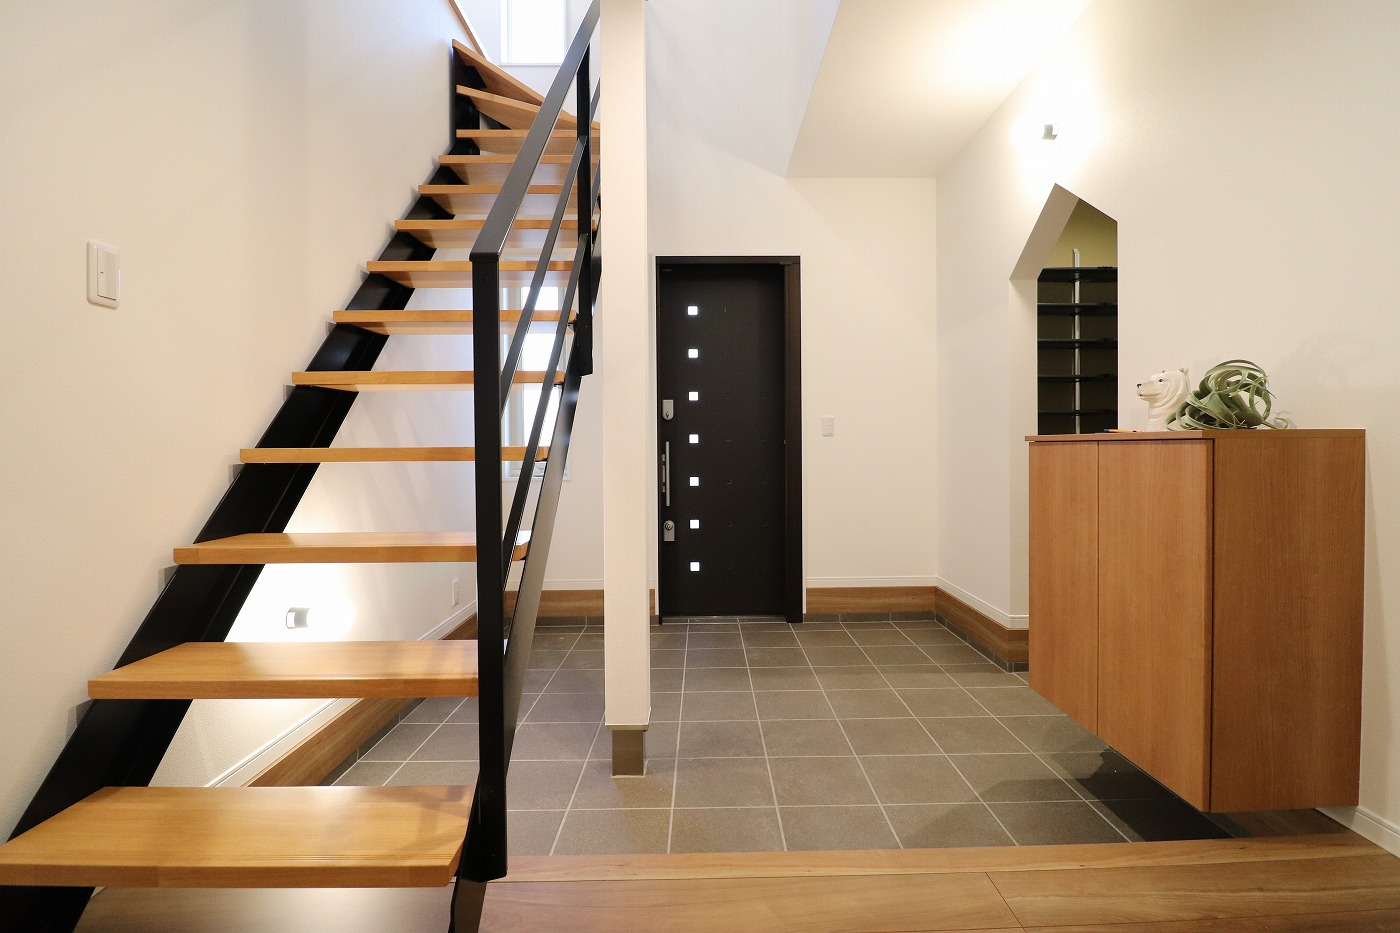 高松市高松町の新築分譲住宅の鉄骨階段土間